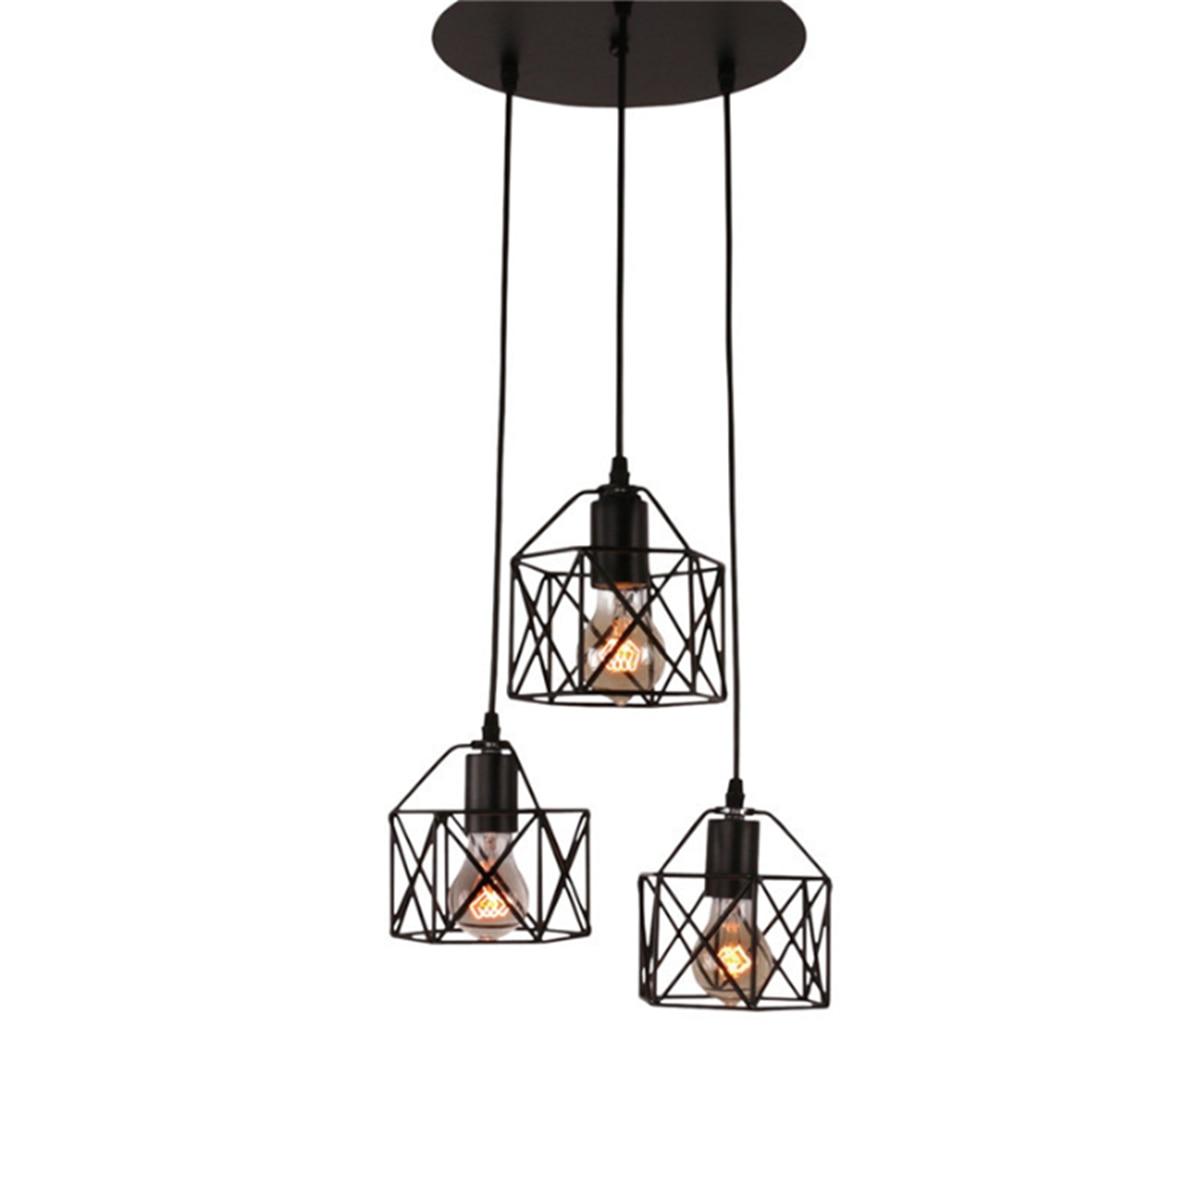 Bronze Antique HJXDtech 3 Way Ceiling Pendant Cluster Light Fitting Lights E27 Socket Hanging Light Industrial Ceiling Lights